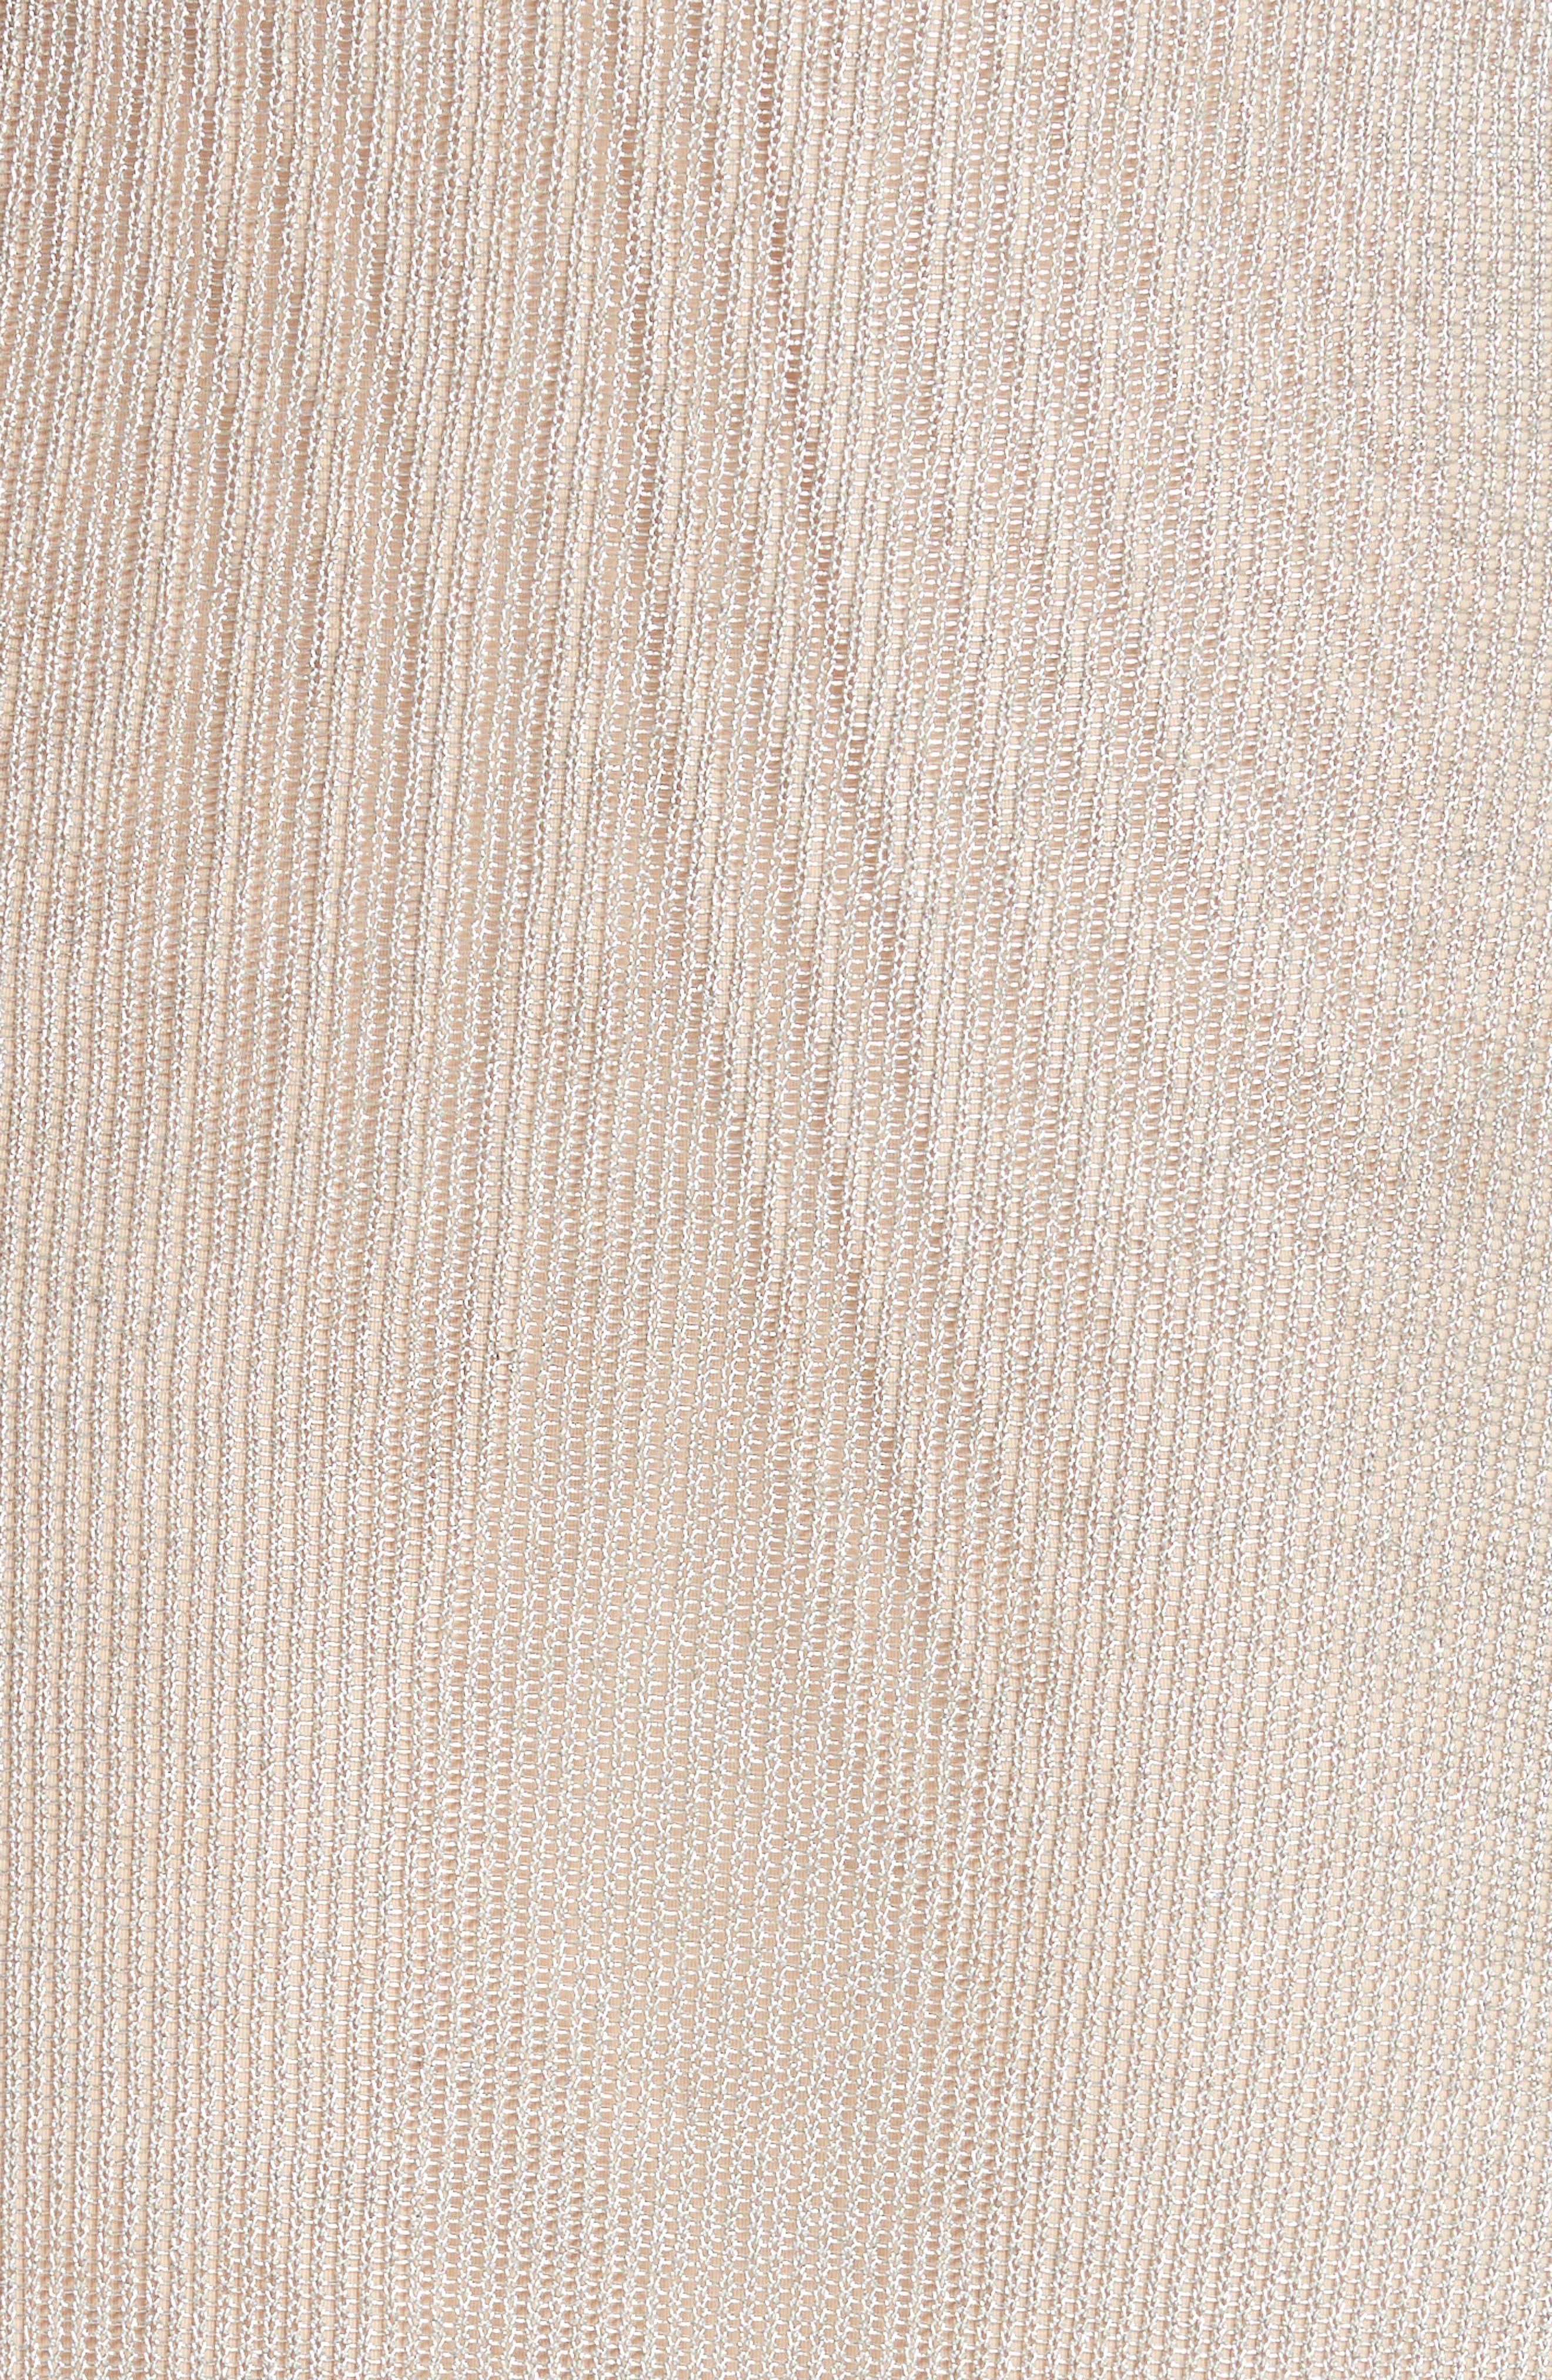 Metallic Rib Turtleneck Dress,                             Alternate thumbnail 7, color,                             SM - SILVER MESH